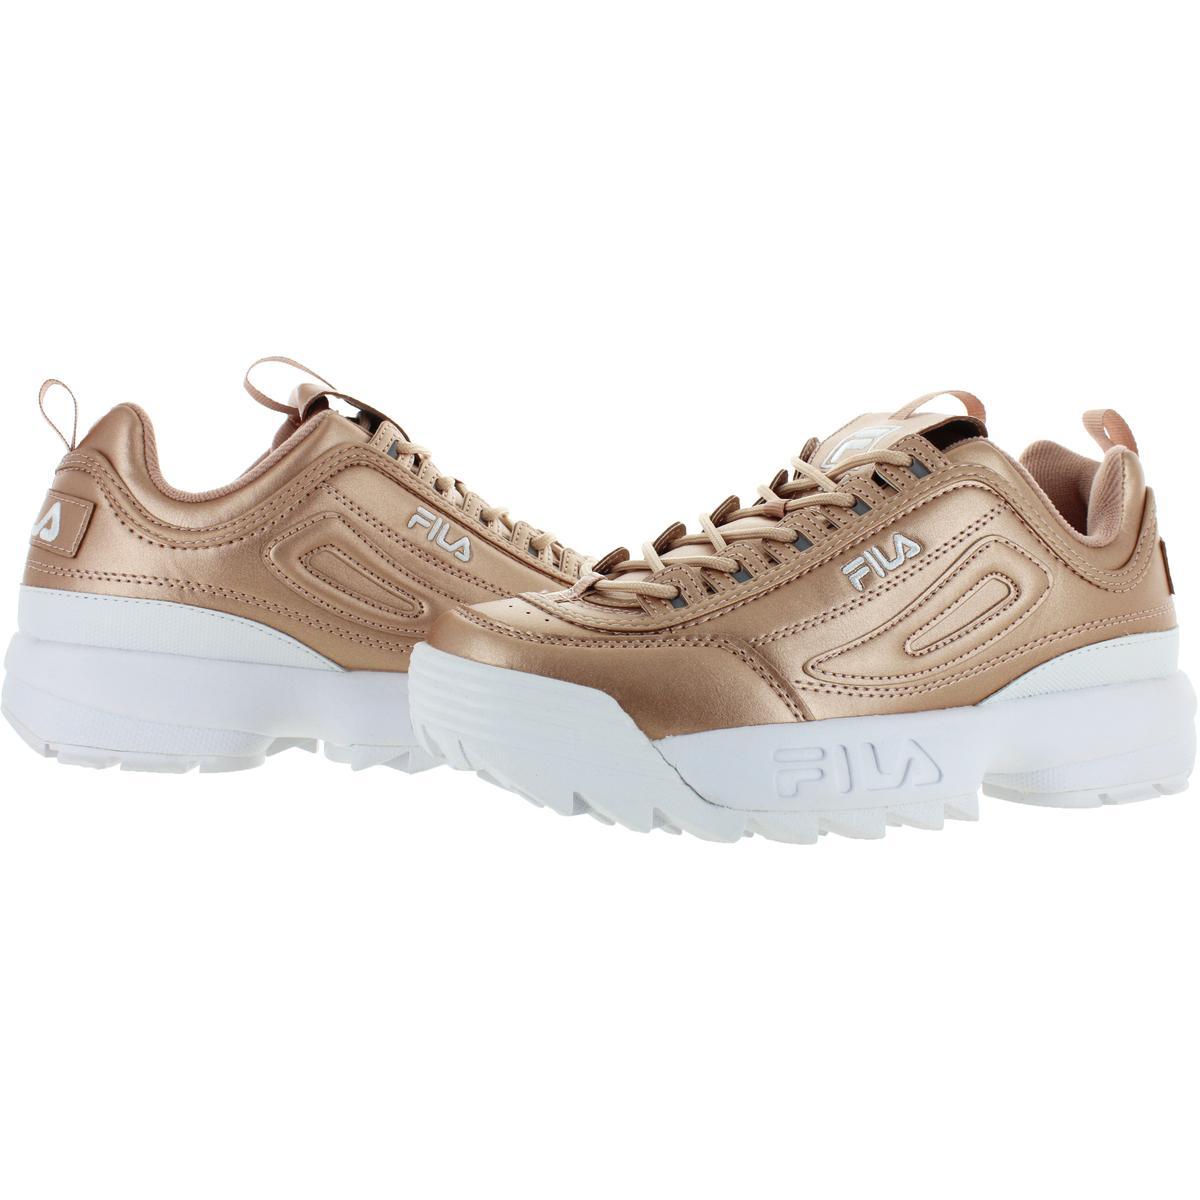 Fila-Womens-Disruptor-II-Premium-Metallic-Trainers-Sneakers-Shoes-BHFO-5237 thumbnail 12